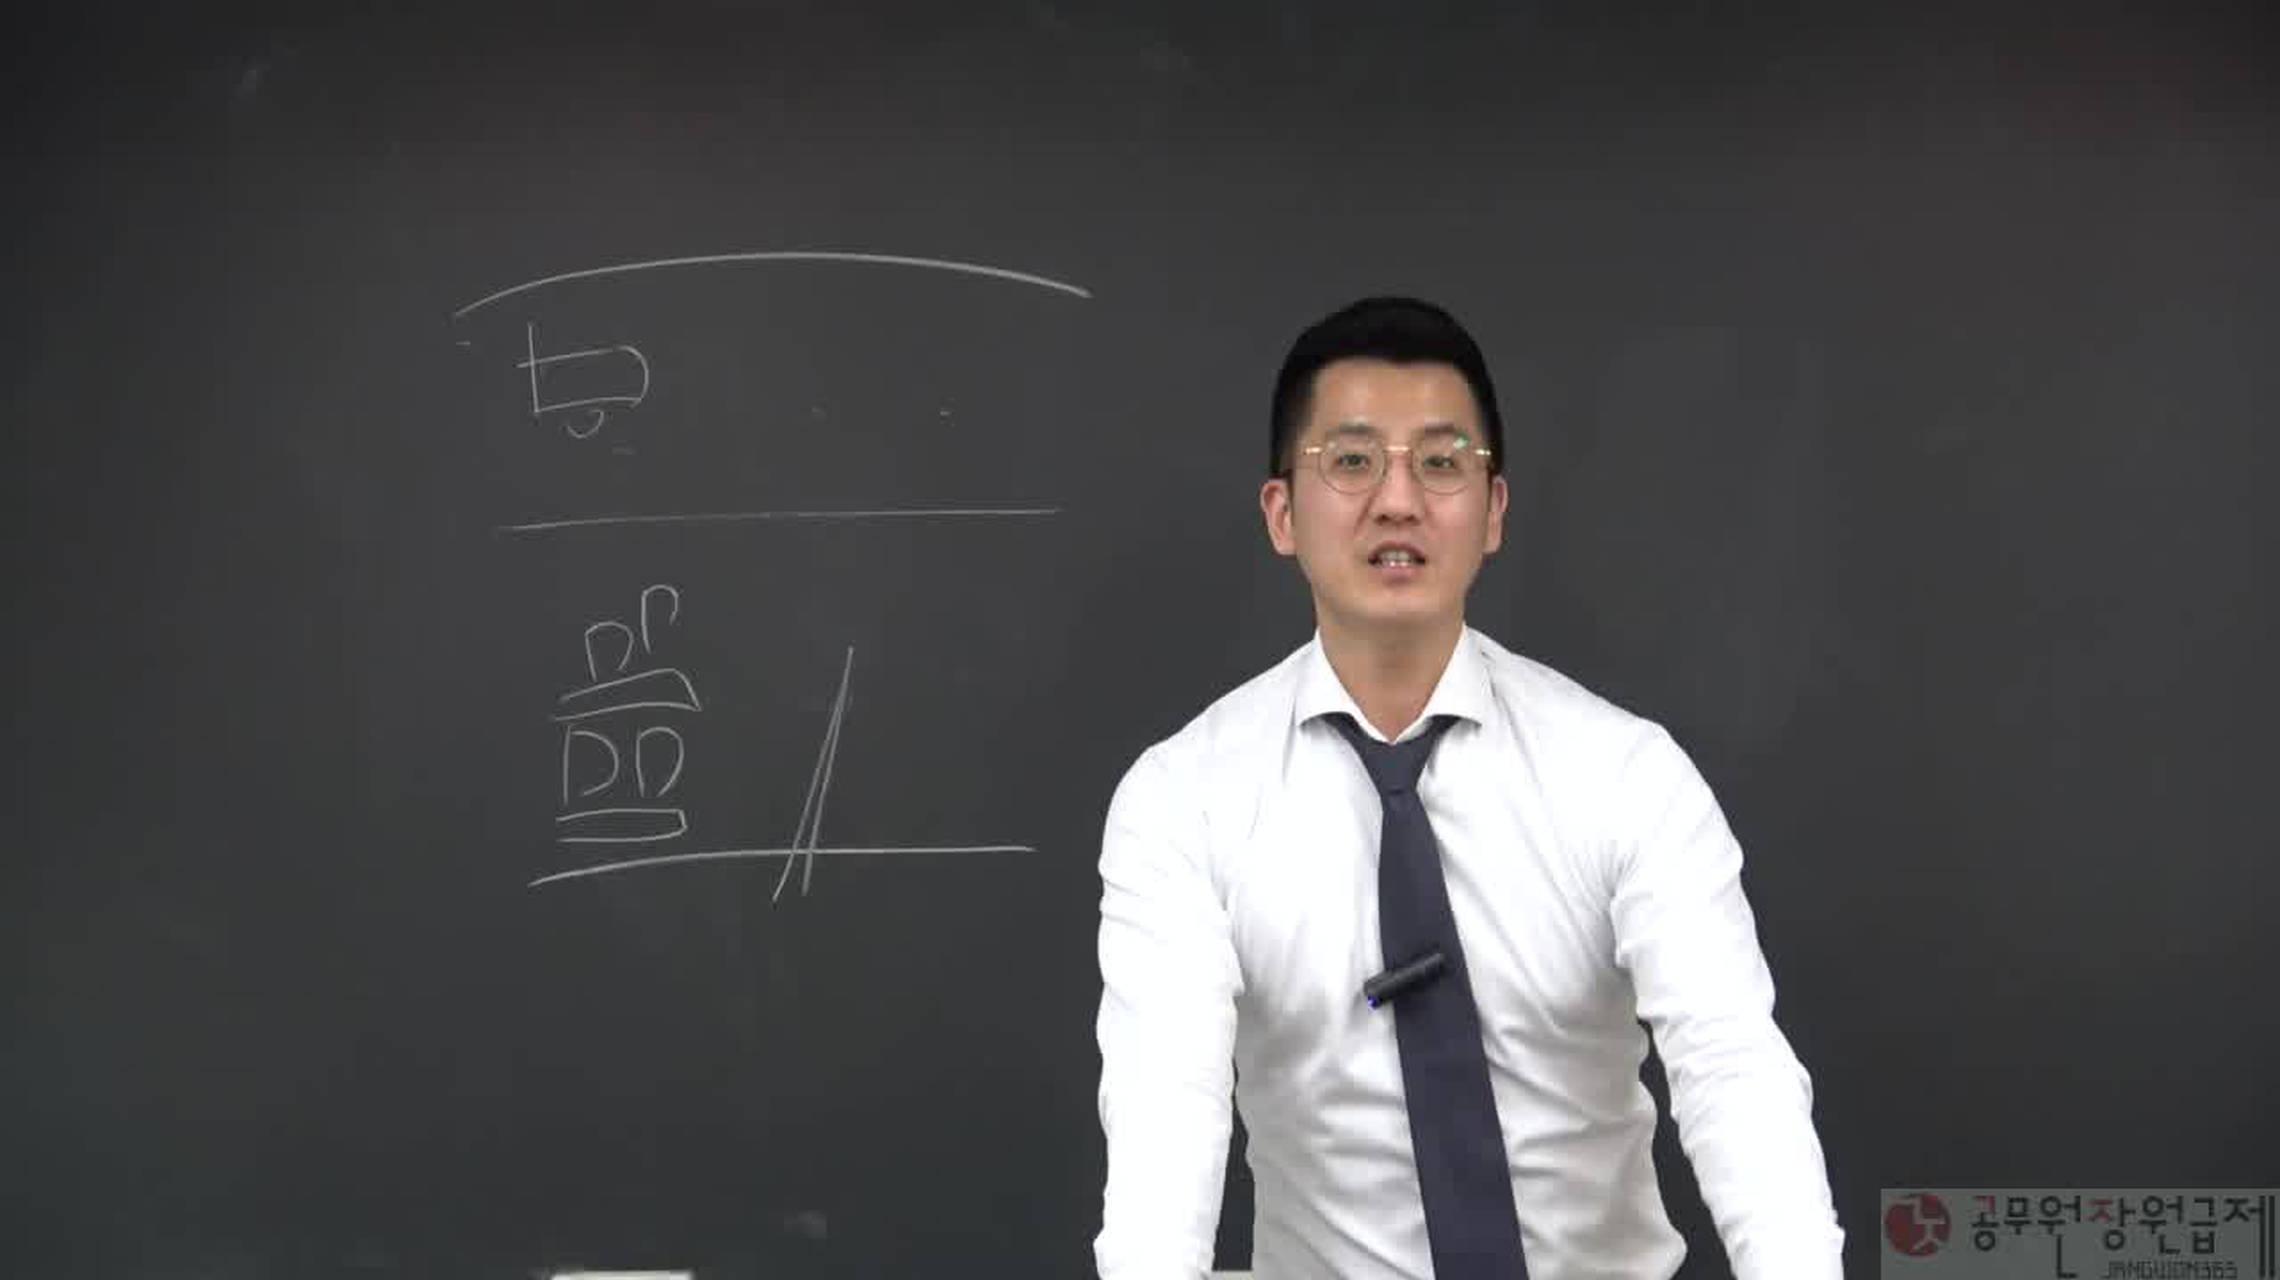 [[ videos[10].title ]]